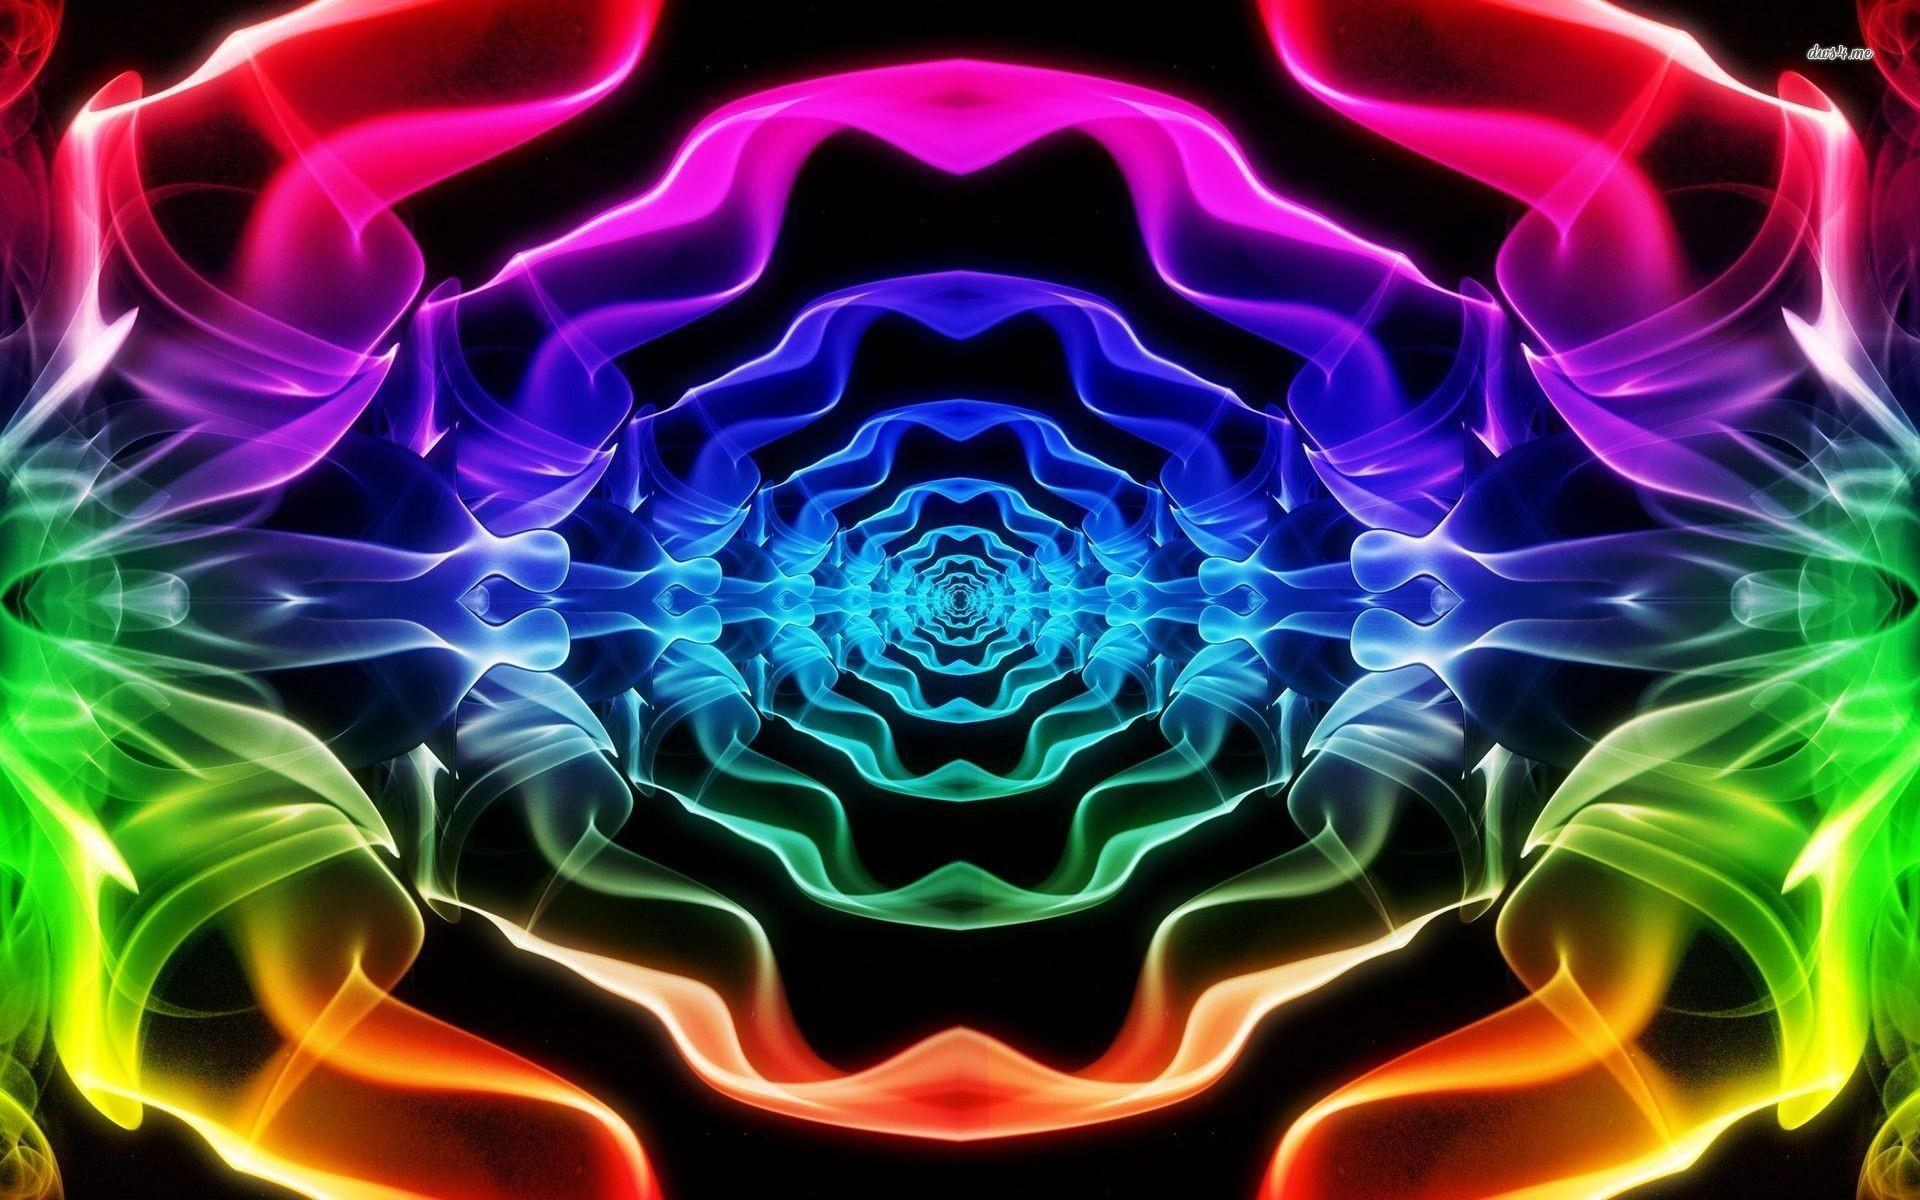 fractal neon smoke wallpaper – https://www.hdofwallpapers.com/fractal